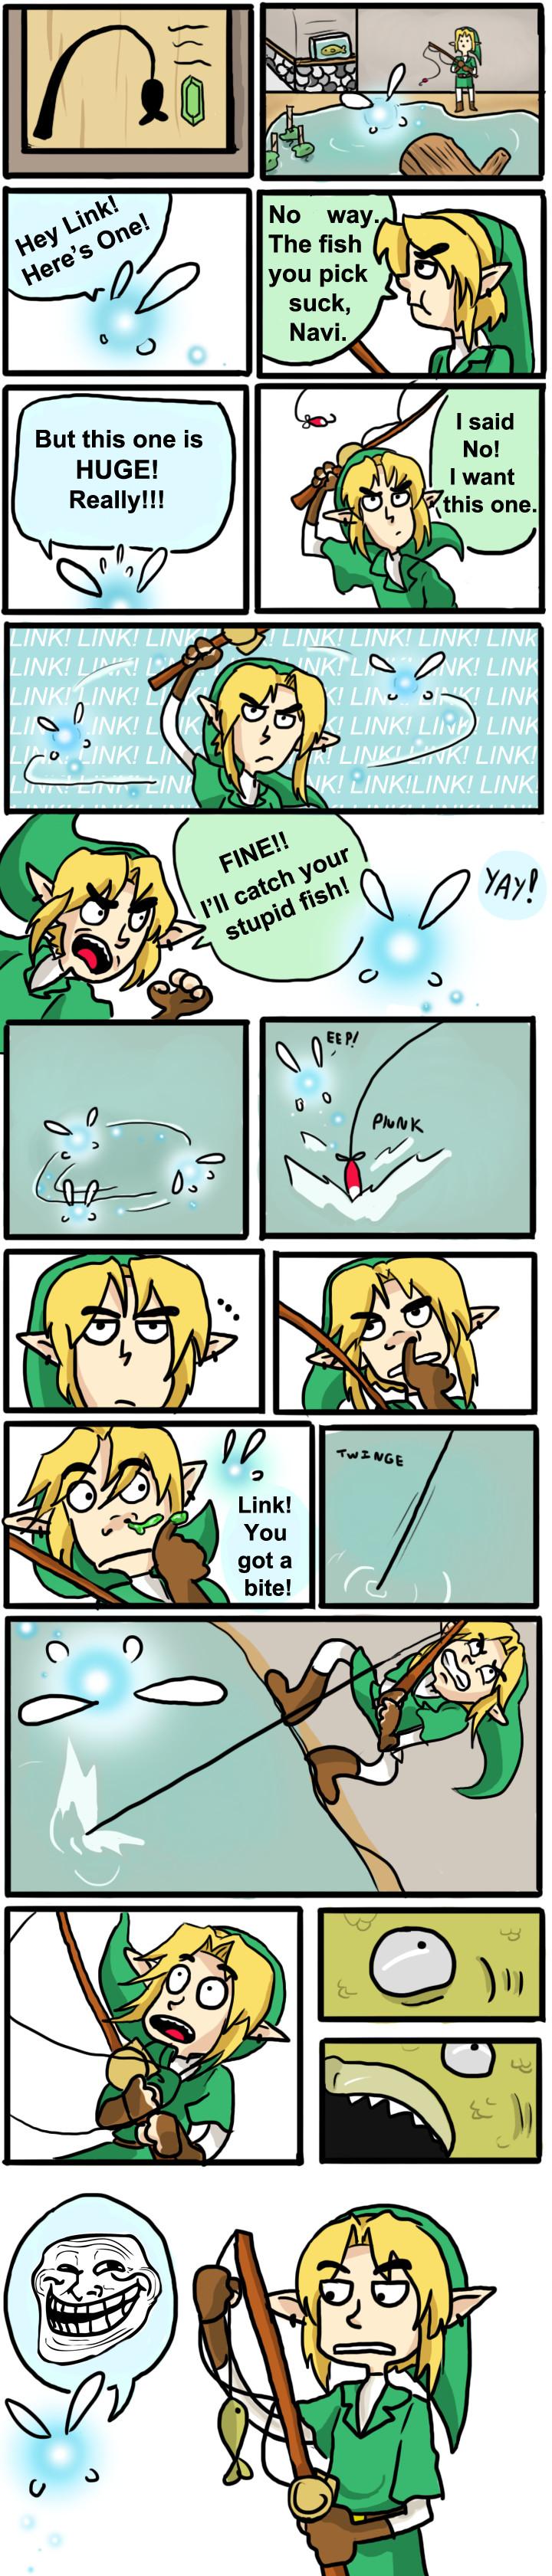 Troll Fishing by LittleGreenHat